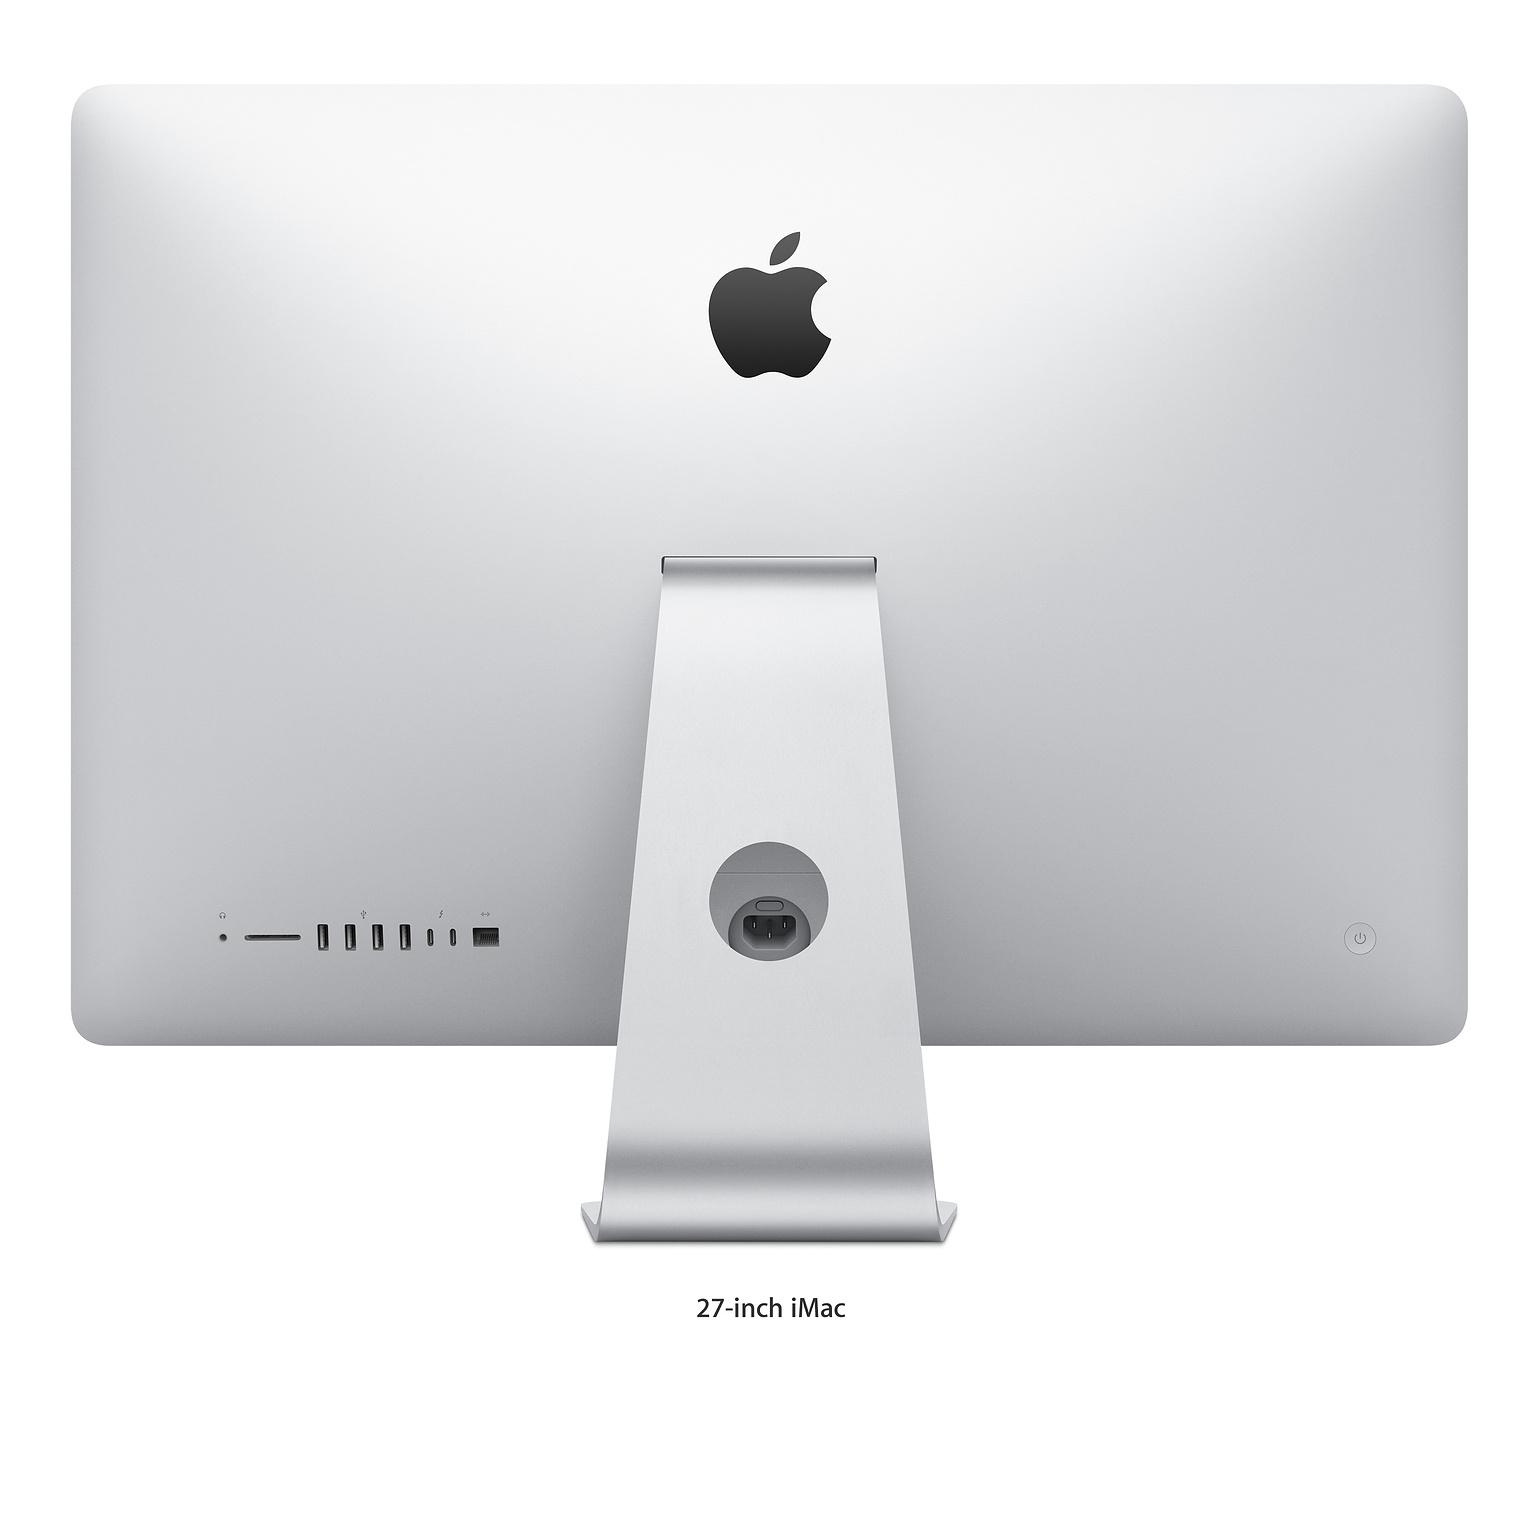 MHK23SA/A - iMac 21.5 inch 4K Retina 2020 - Intel Core i3 Gen 8 3.6GHz quad-core / 256GB